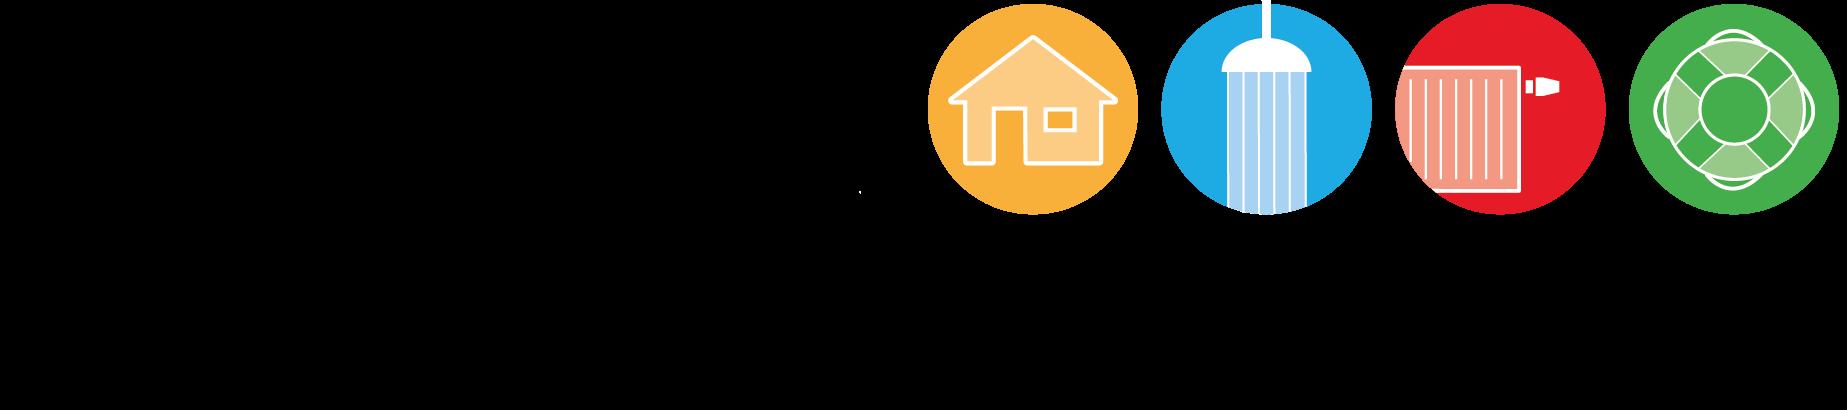 installateur allach logo